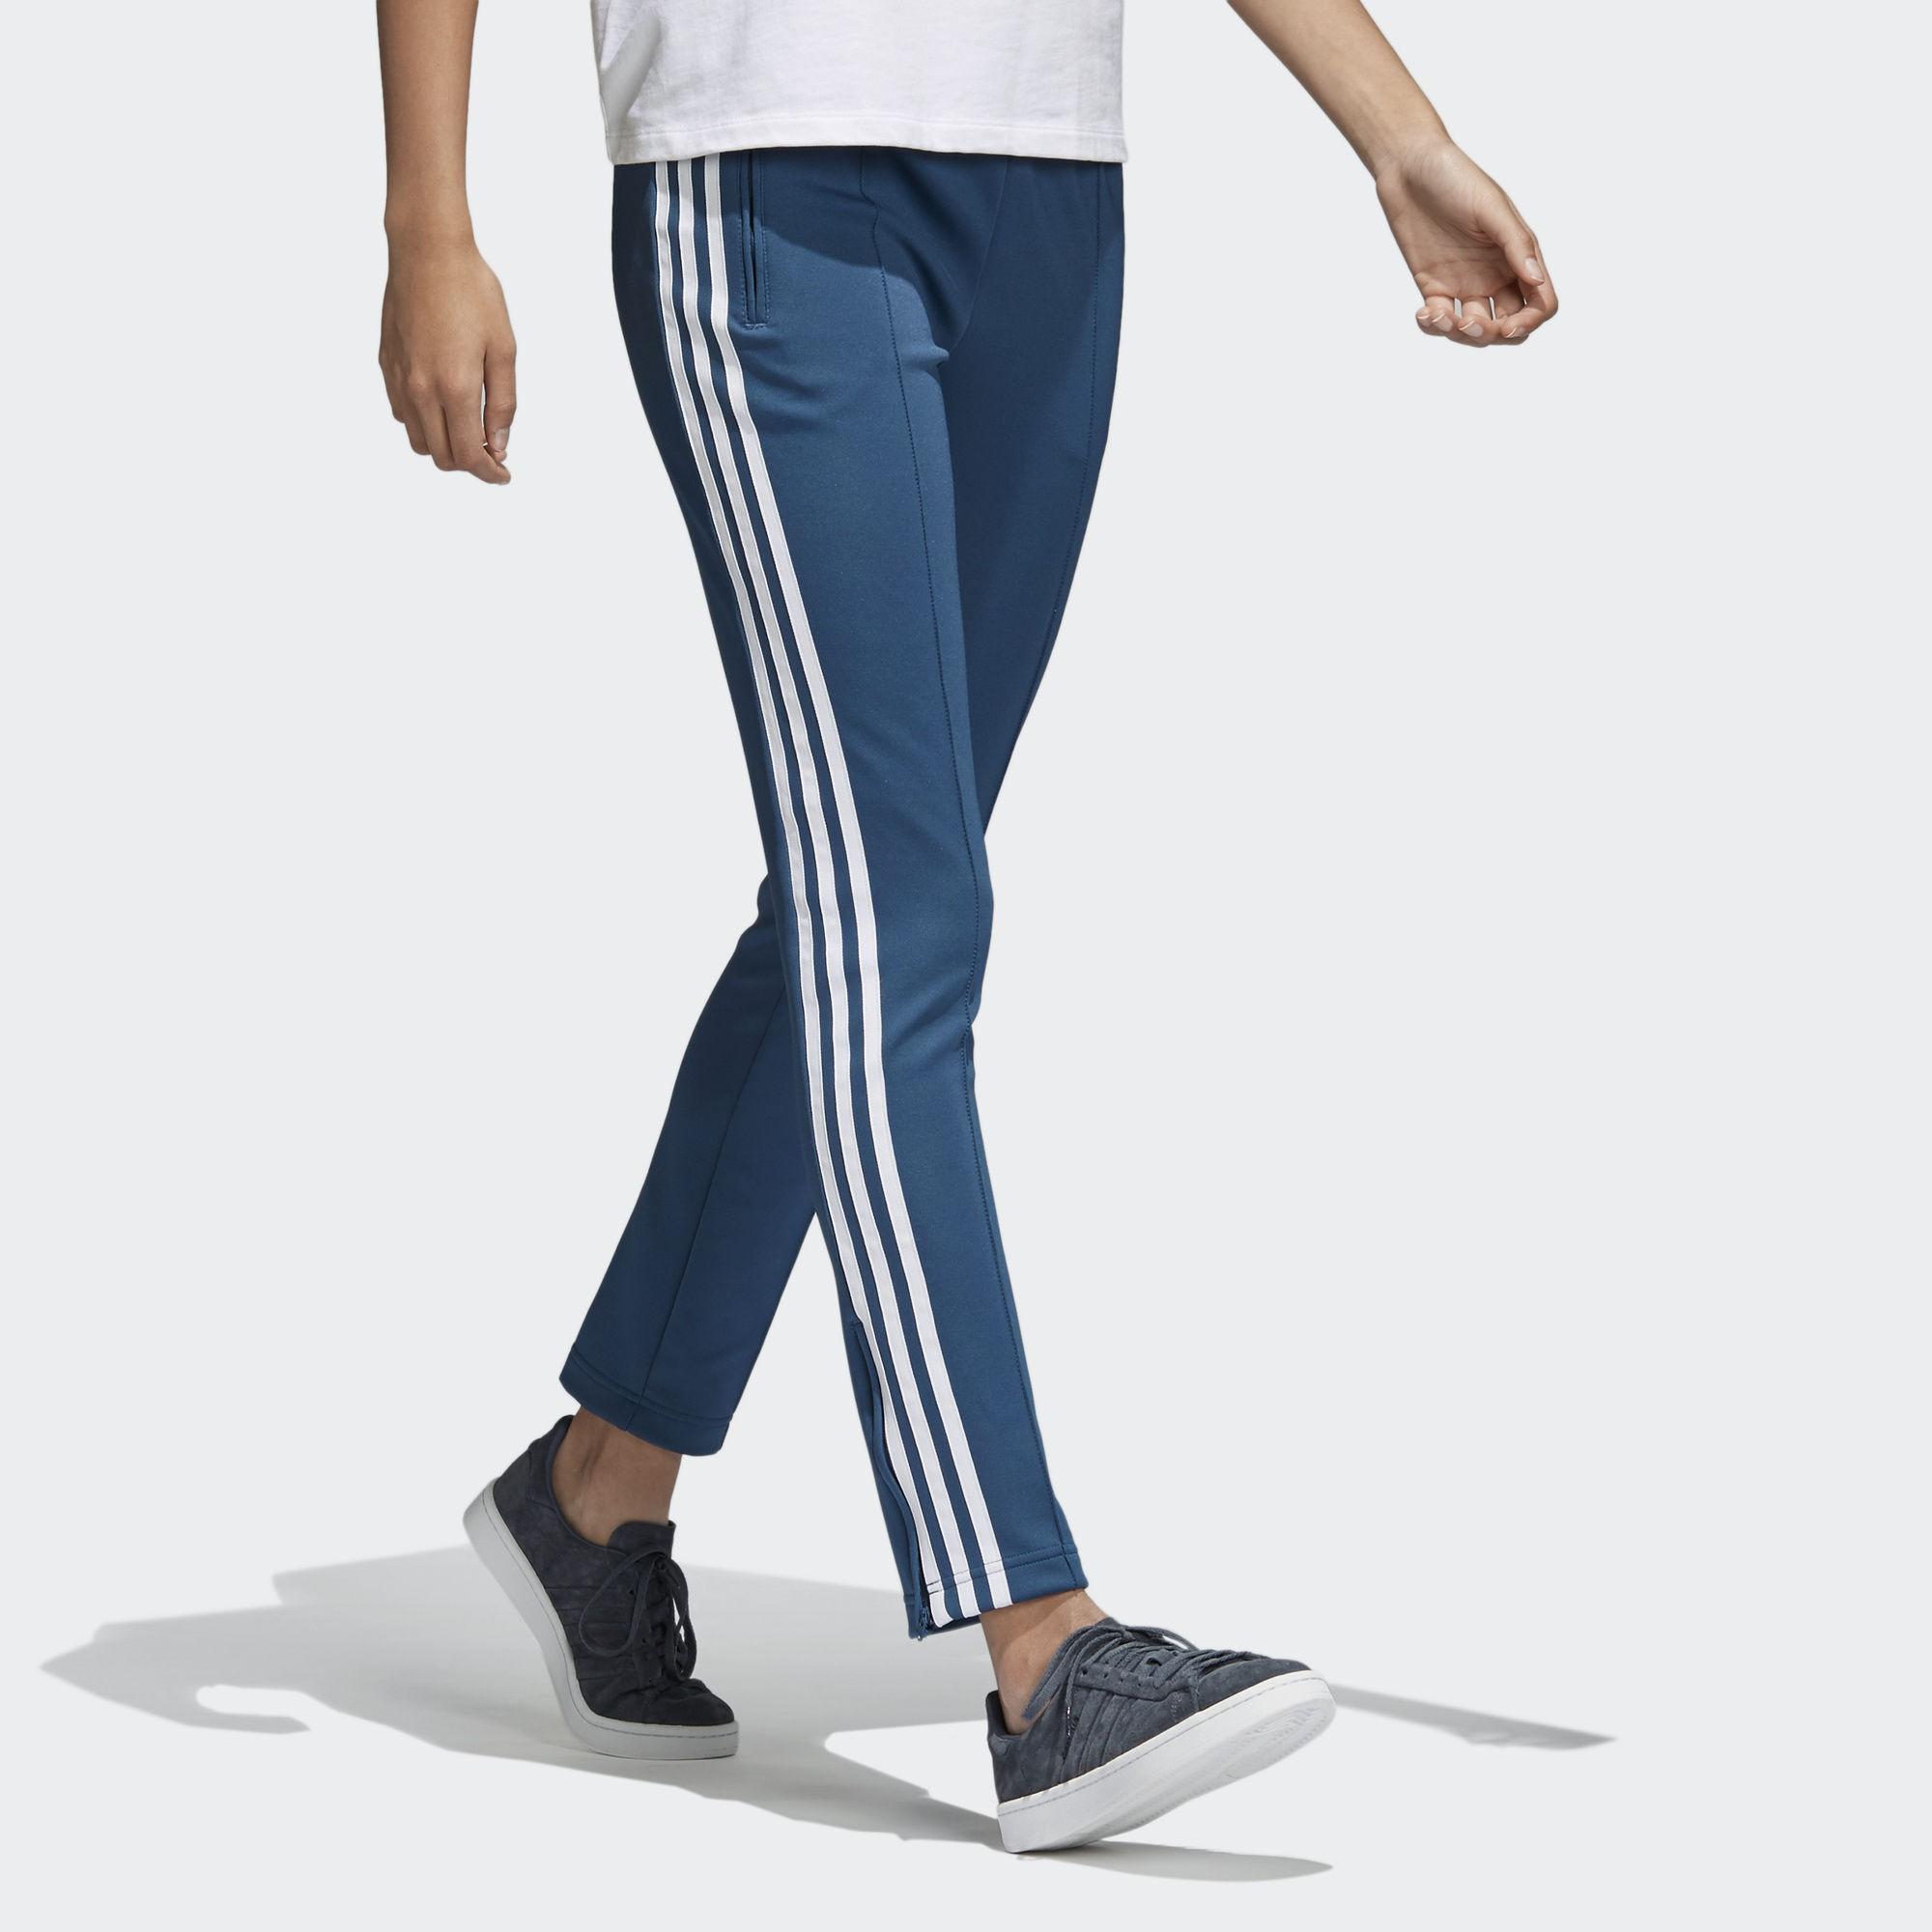 665138d96d1bd Venta de Pantalón Adidas Sst Tp Azul Mujer - Deportes Moya